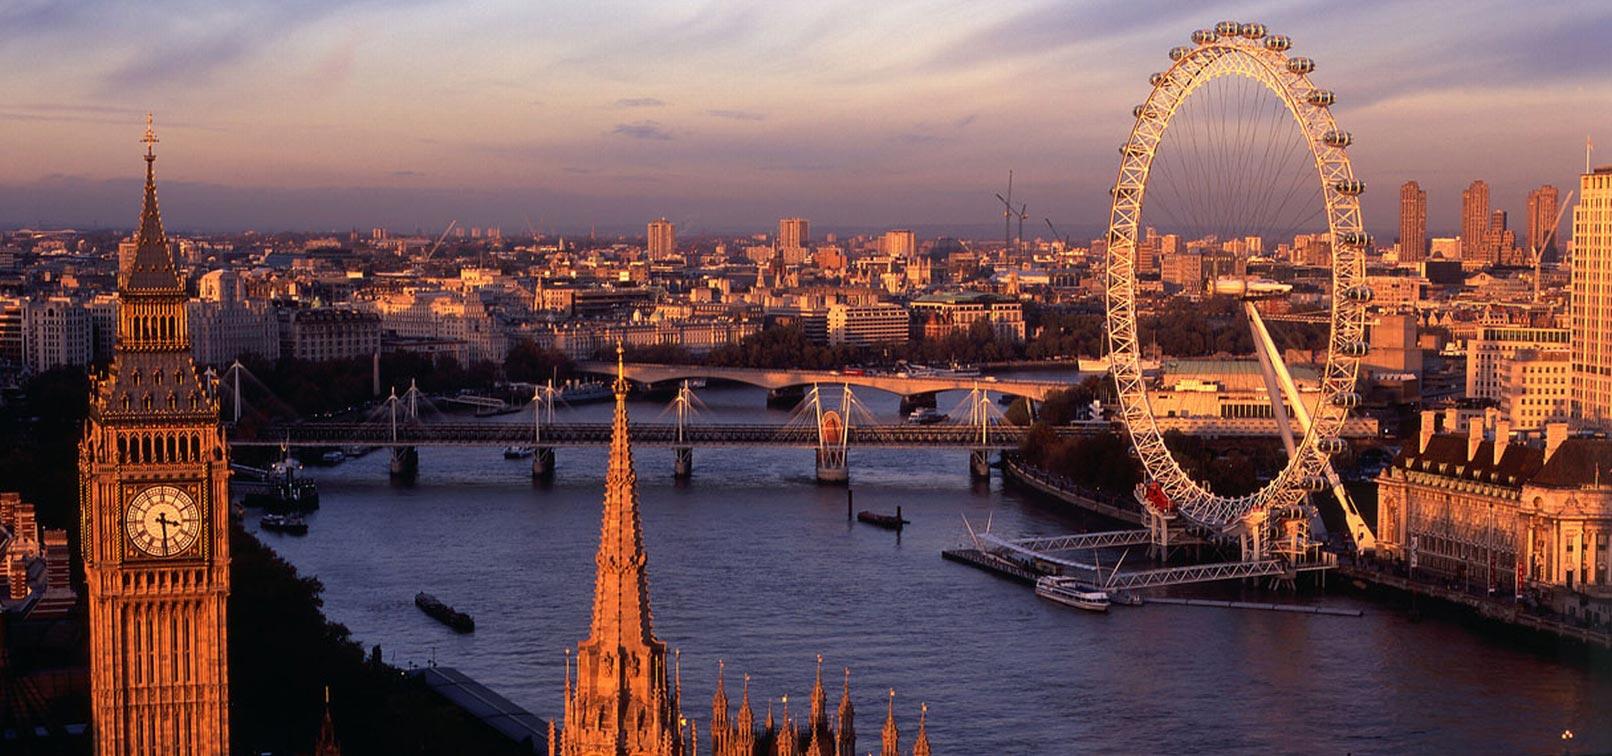 Travel destinations of a lifetime: London England (photo www.excel-london.co.uk)